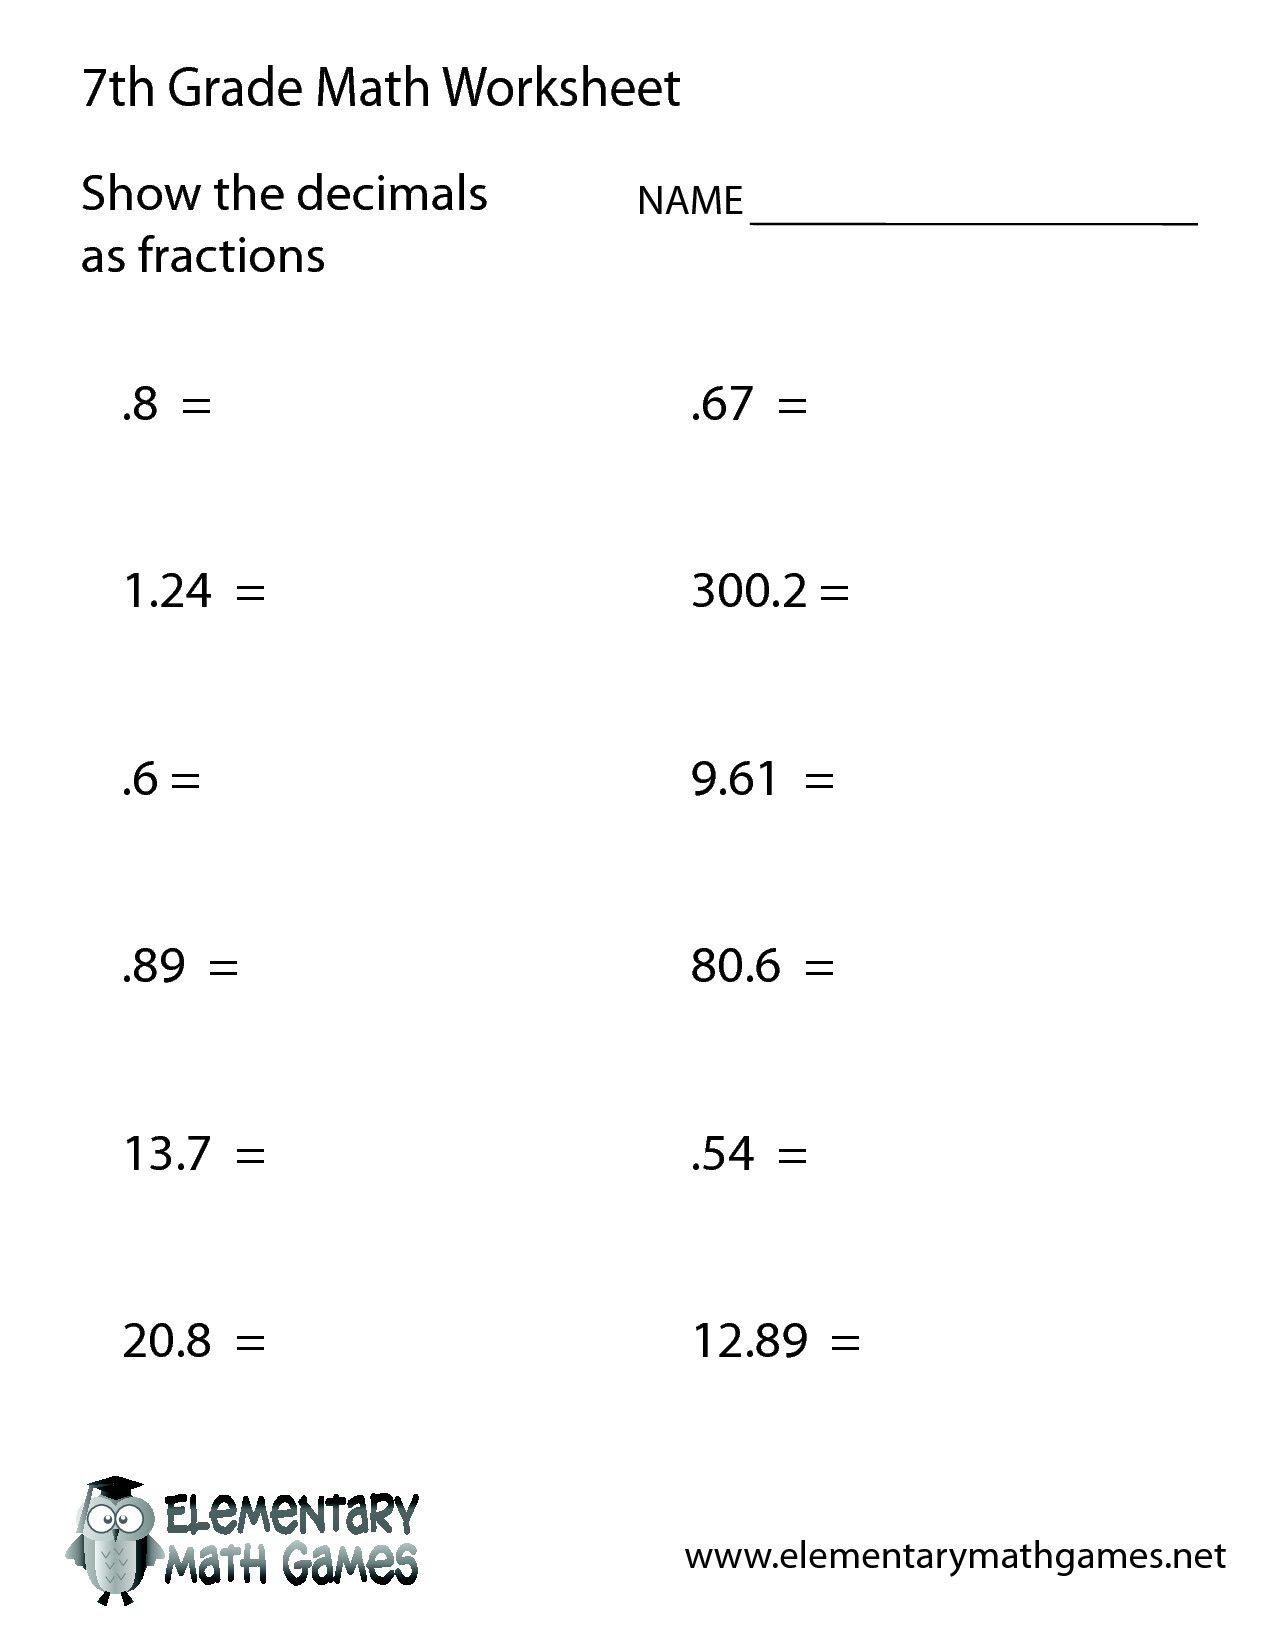 41 Stunning 6th Grade Math Worksheets Design 7th Grade Math